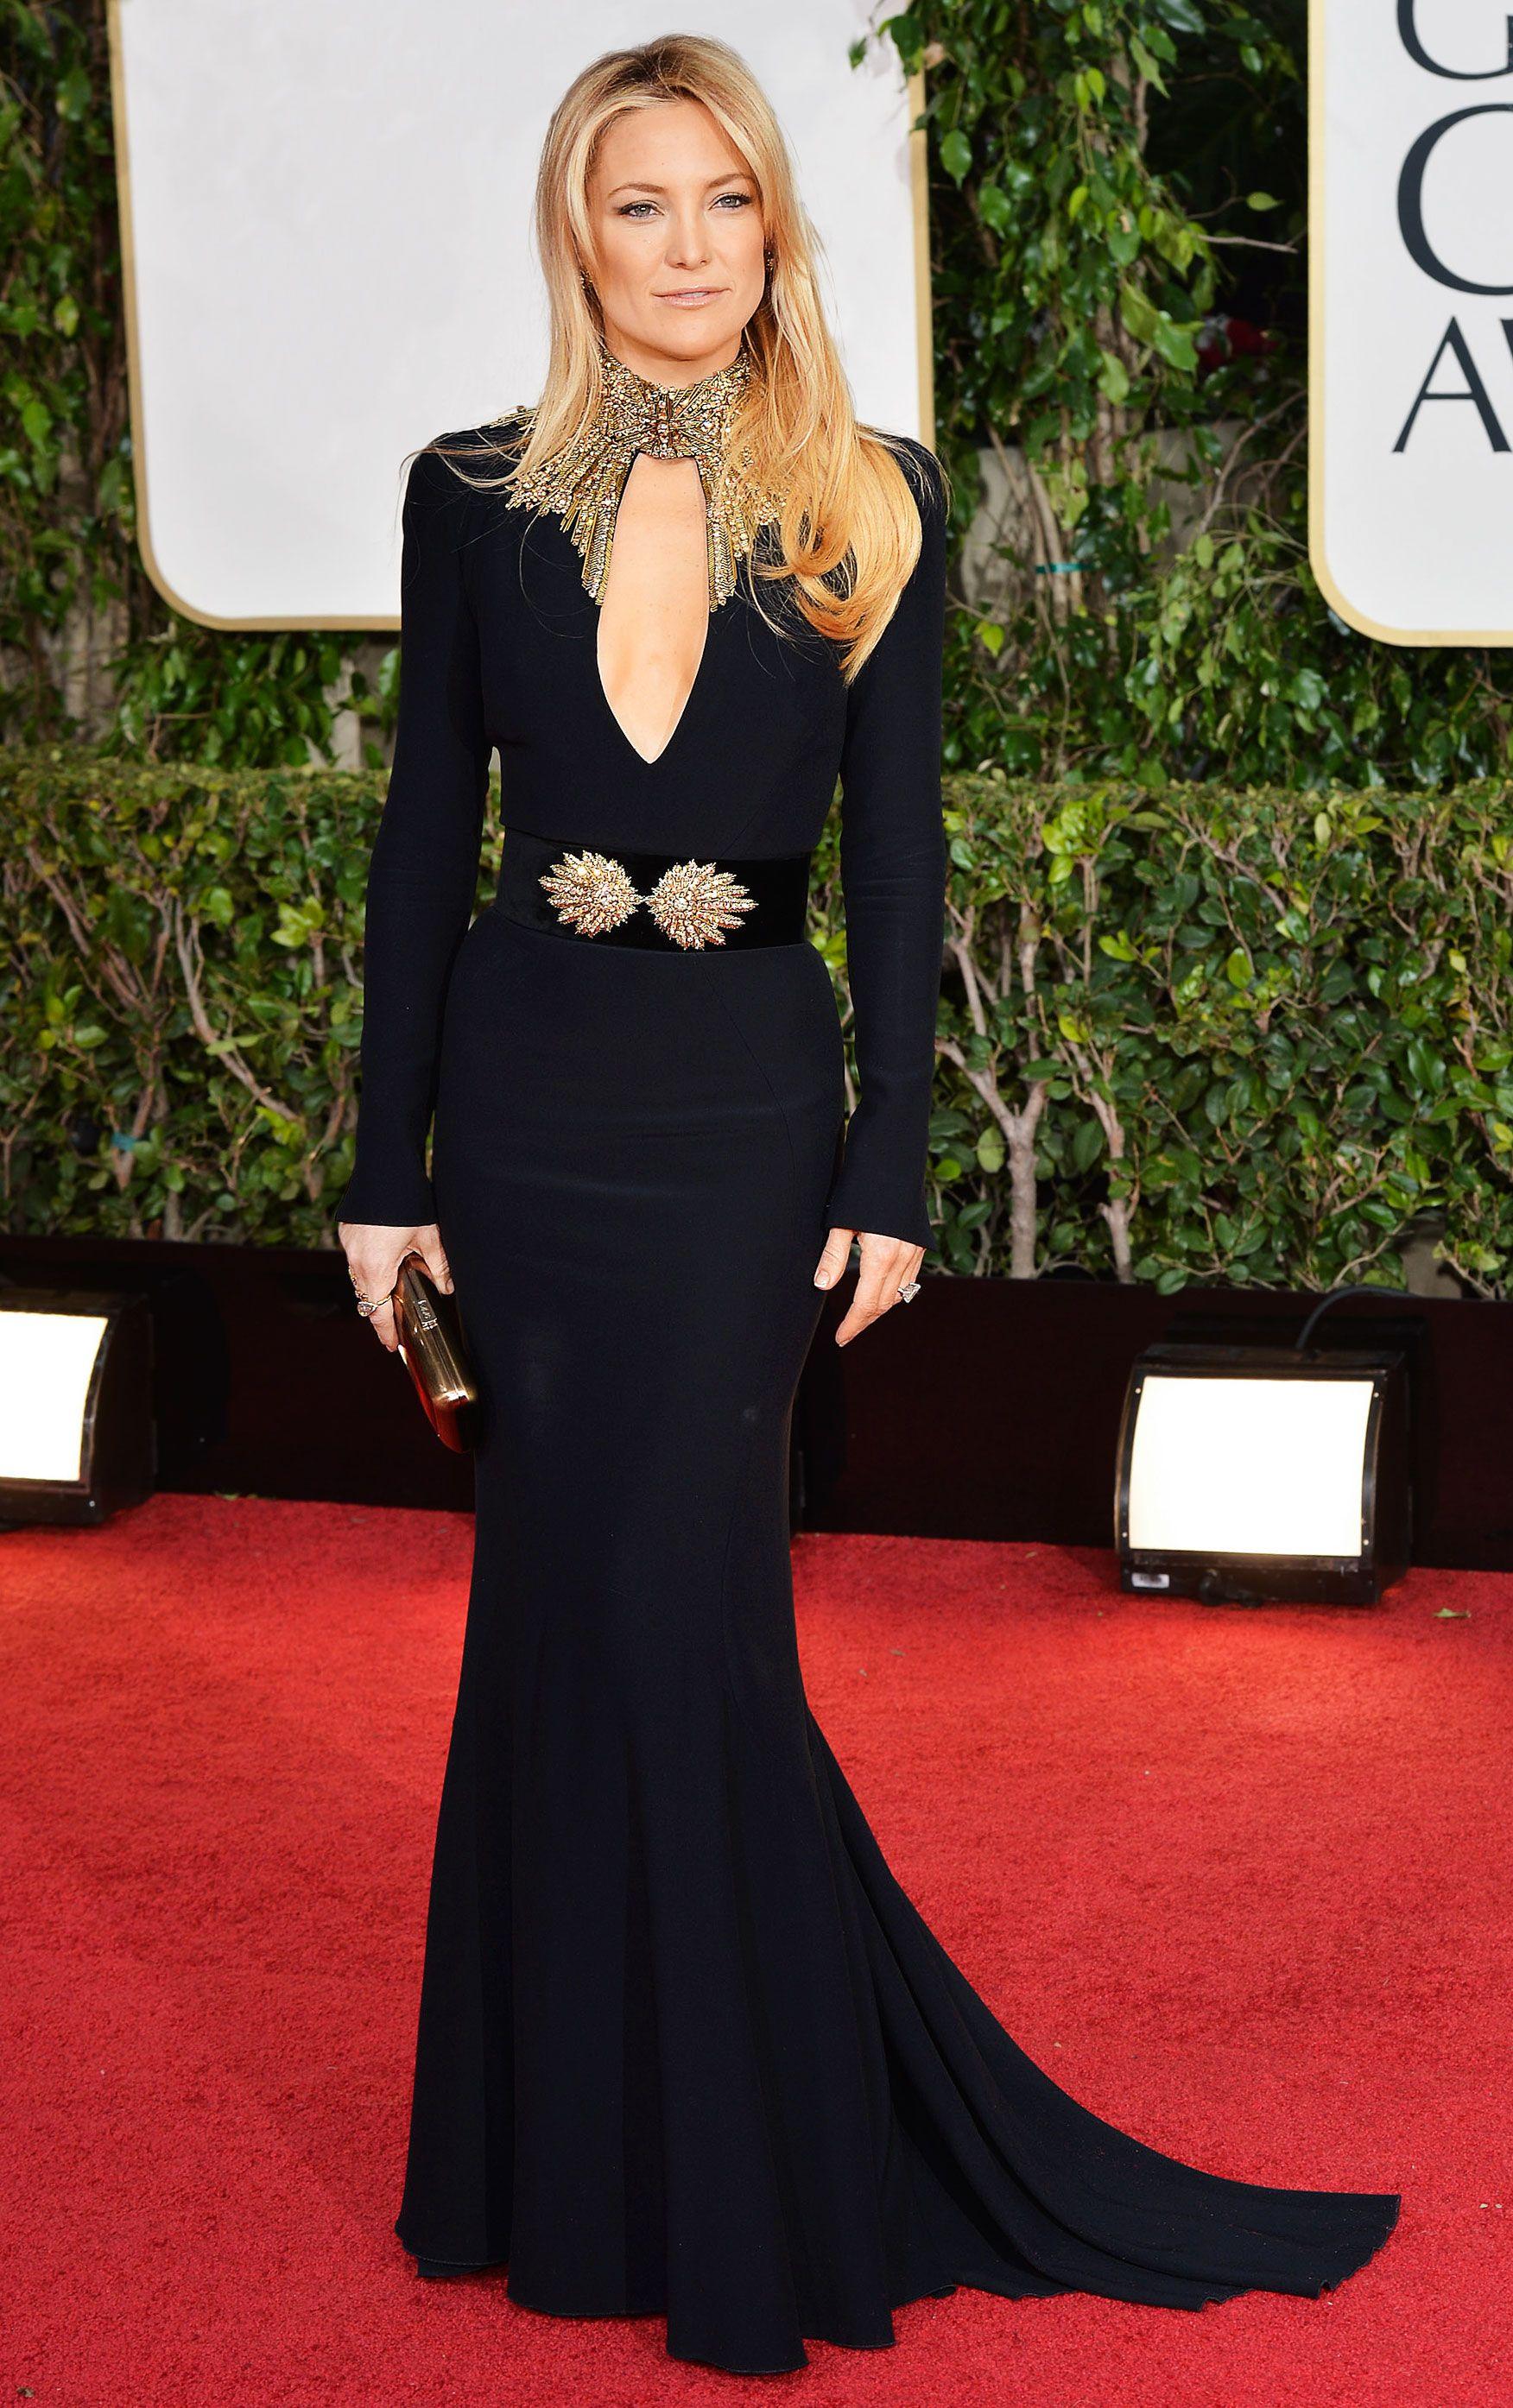 We Found Kate Hudson S 10 Best Red Carpet Looks Ever Red Carpet Dresses Black Dress Red Carpet Golden Globes Dresses [ 2789 x 1752 Pixel ]